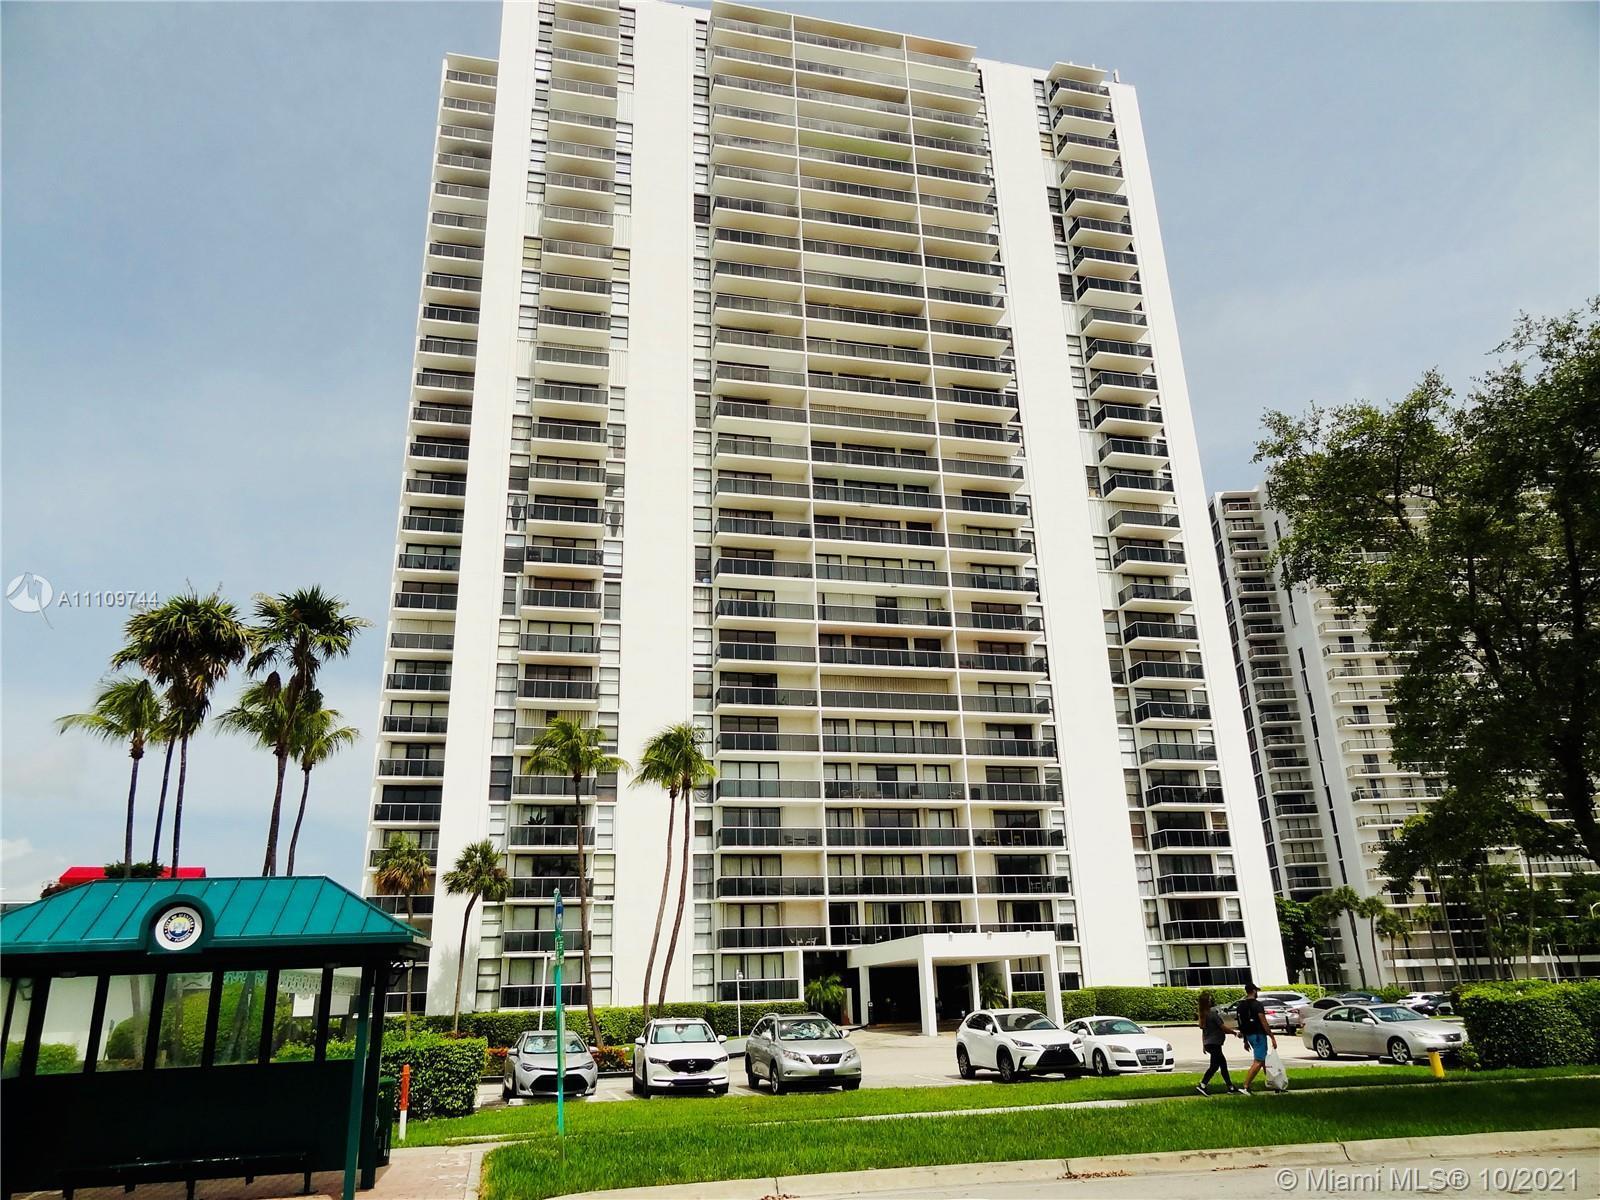 Beautiful 2/2 apartment at EL Dorado in Aventura close to Aventura Mall and all mayor Roads like I95